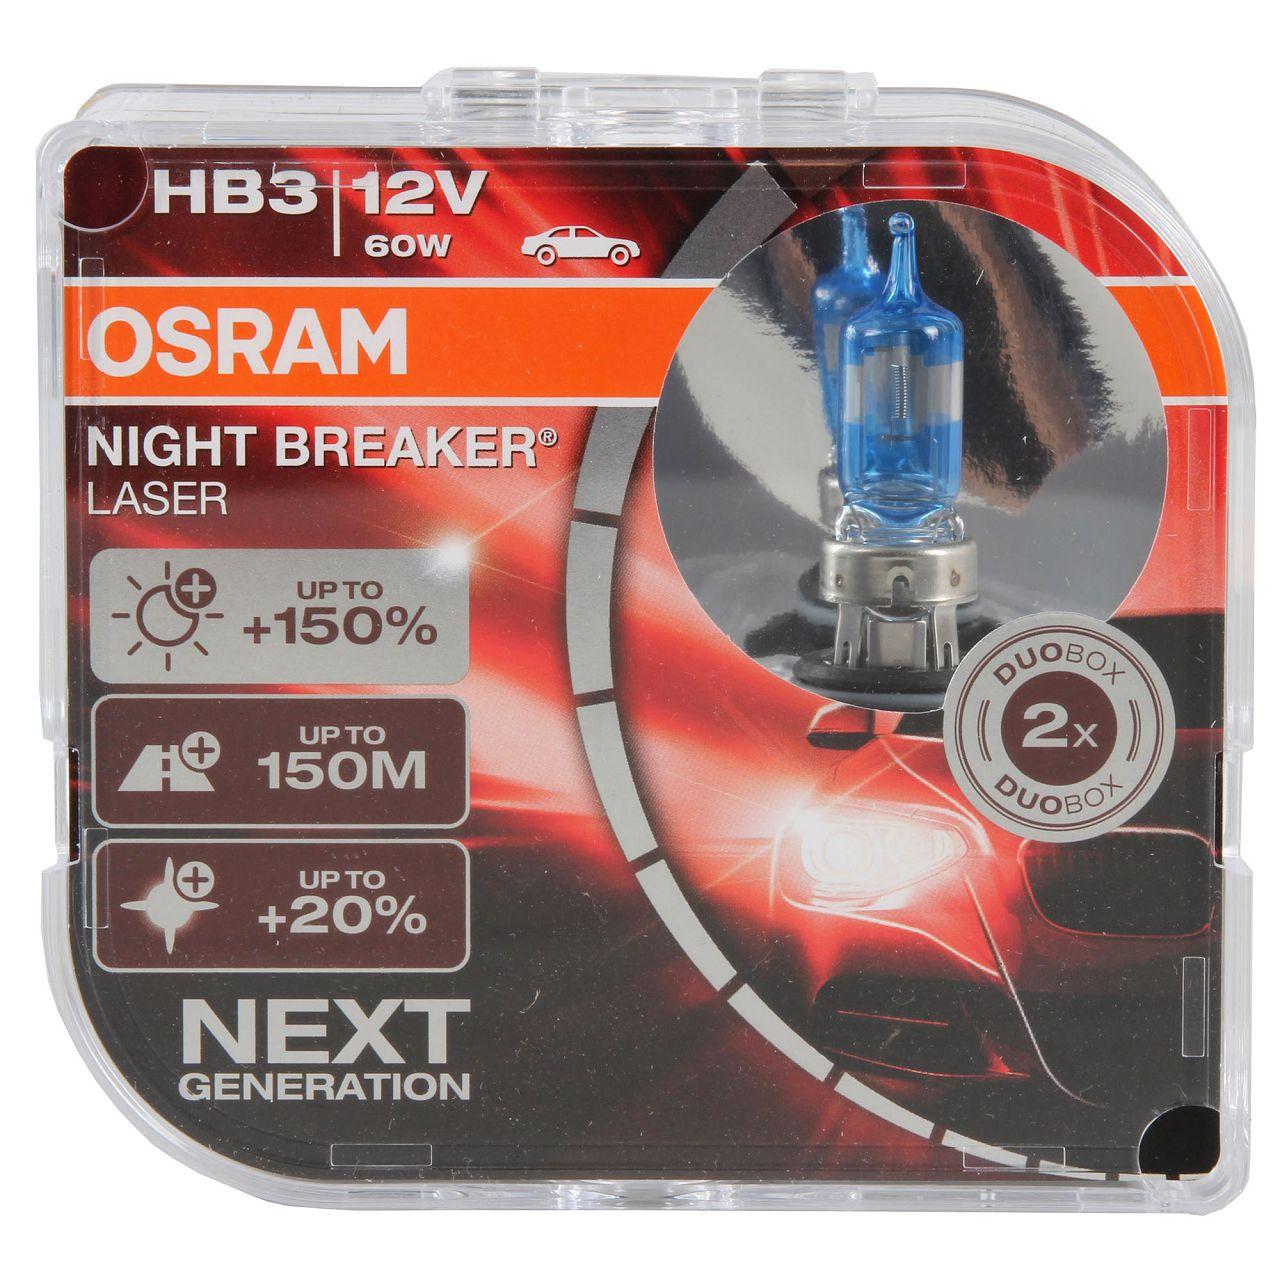 2x OSRAM Glühlampe HB3 NIGHT BREAKER LASER 12V 60W P20d next Generation +150%